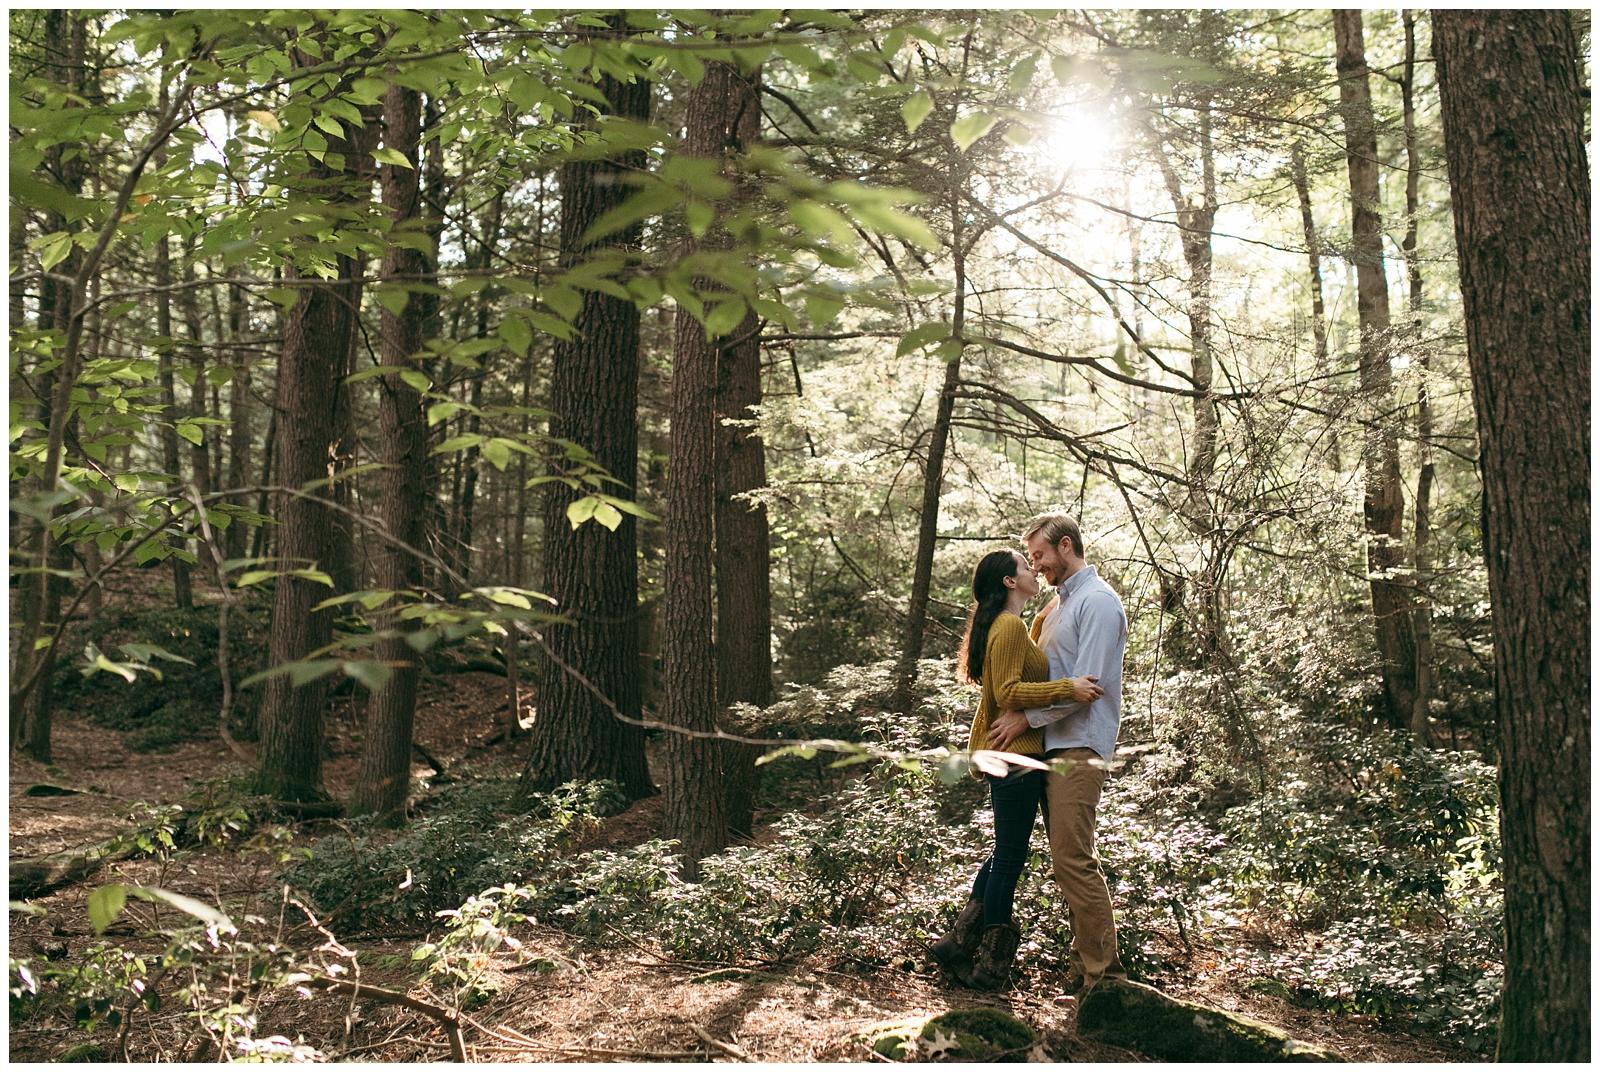 Connecticut-Engagement-Photographer-Bailey-Q-Photo-03.jpg